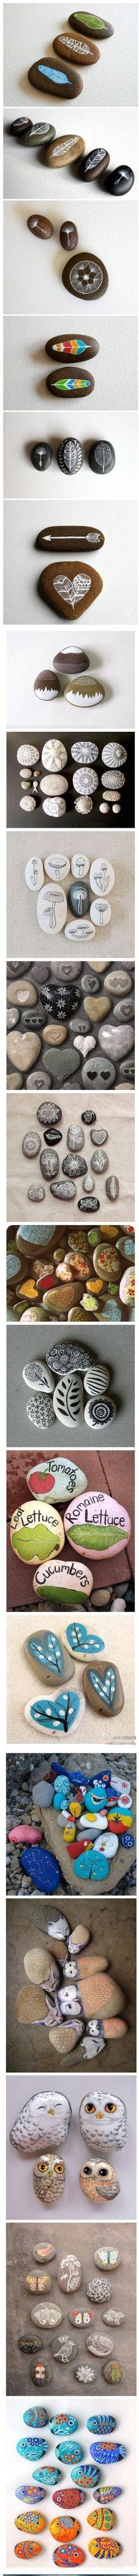 Pebble Art Creative Designs by batjas88